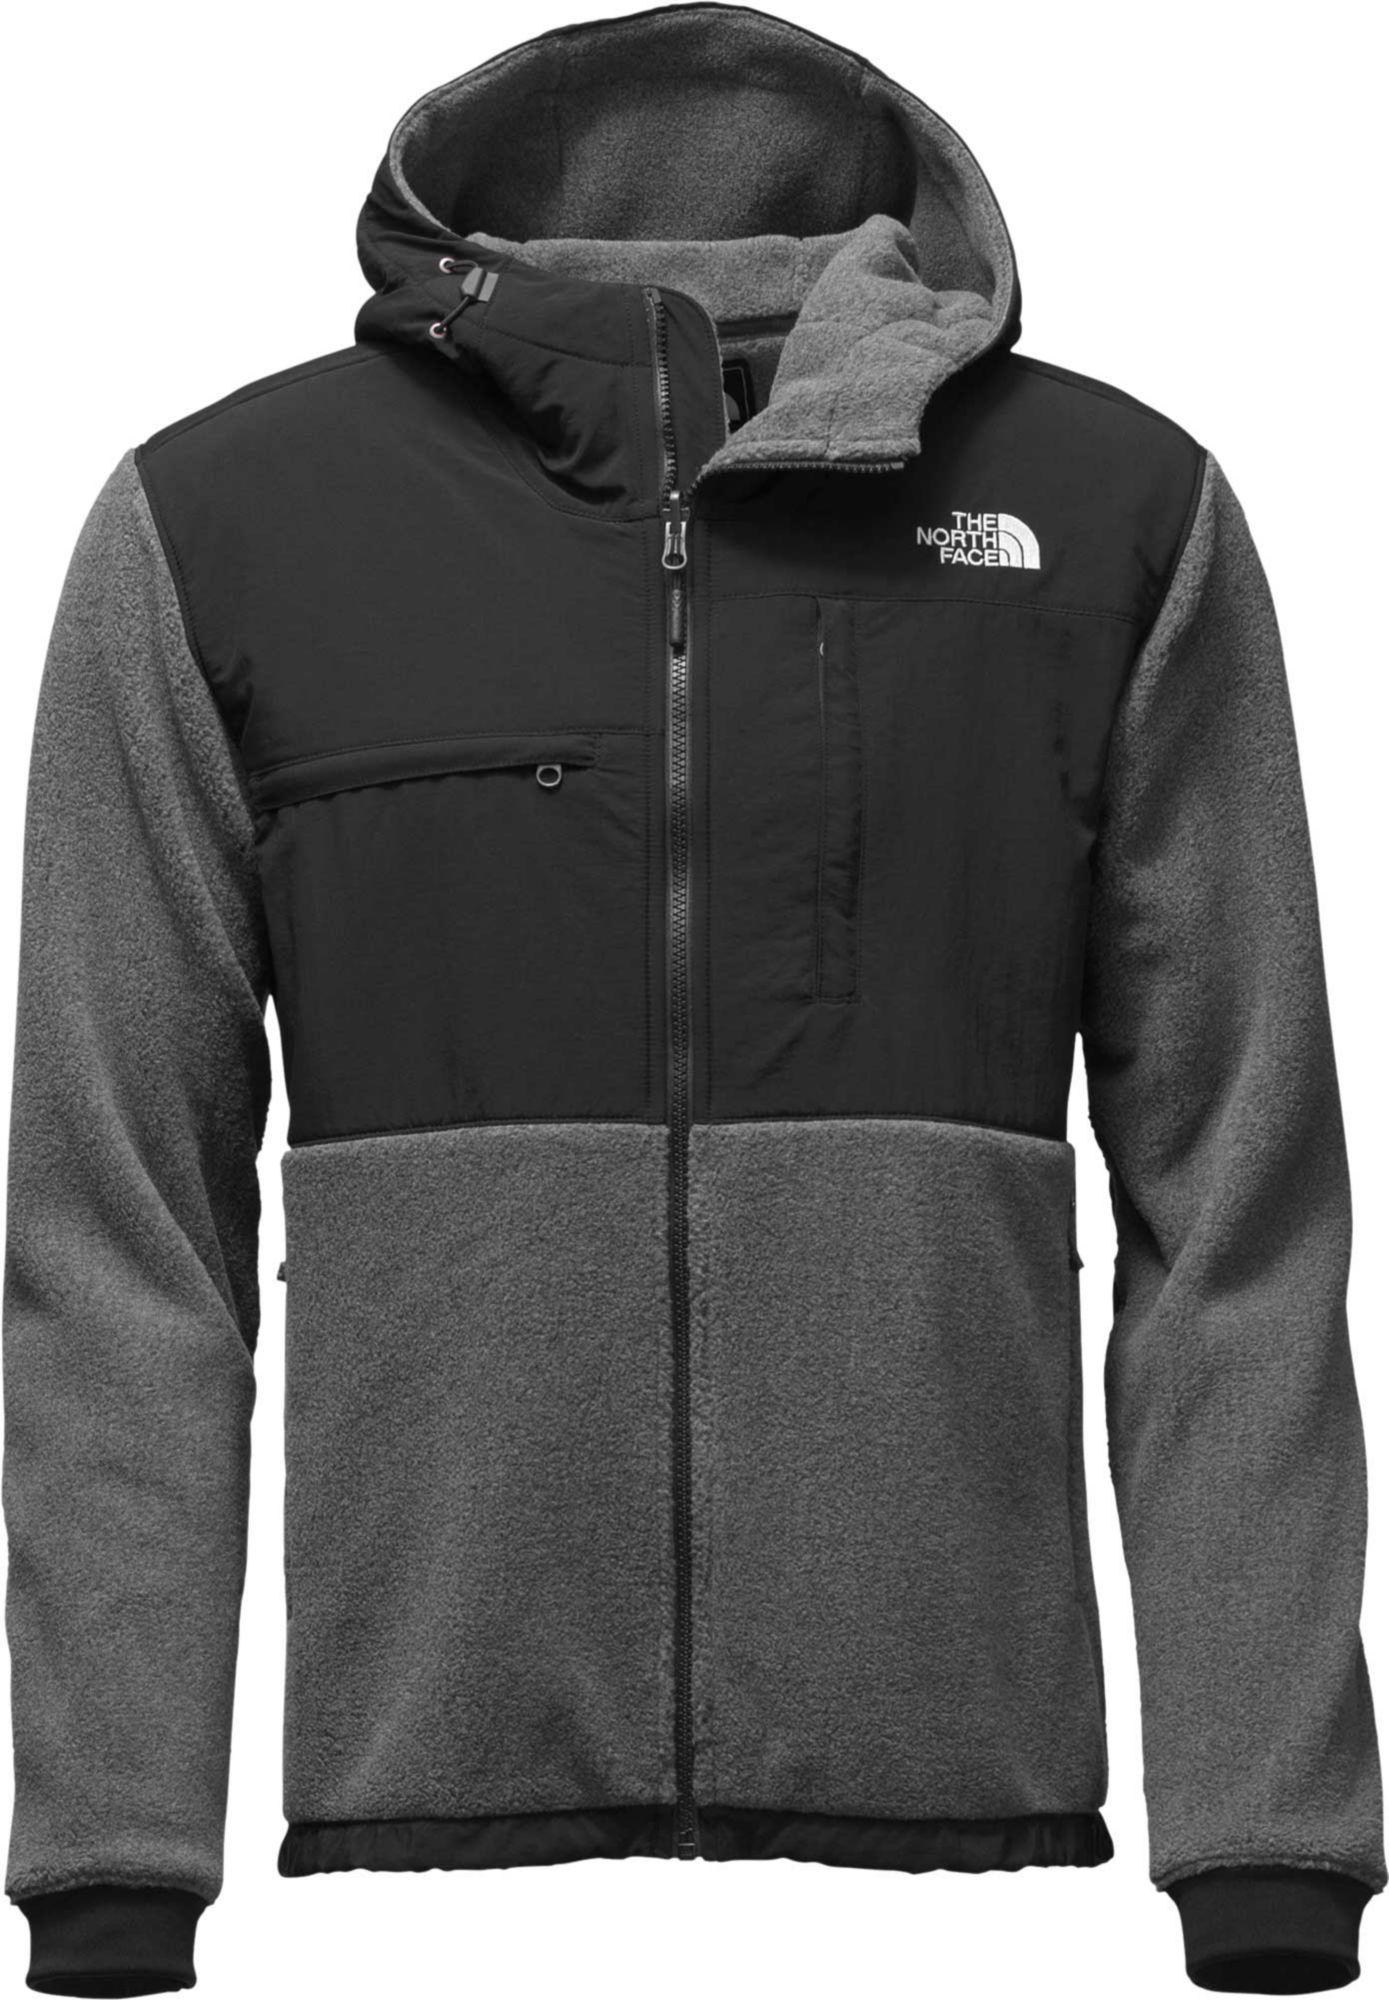 The North Face Men S Denali 2 Hooded Fleece Jacket Size Large Gray North Face Mens Hoodie Jacket Men Men S Coats And Jackets [ 2000 x 1389 Pixel ]